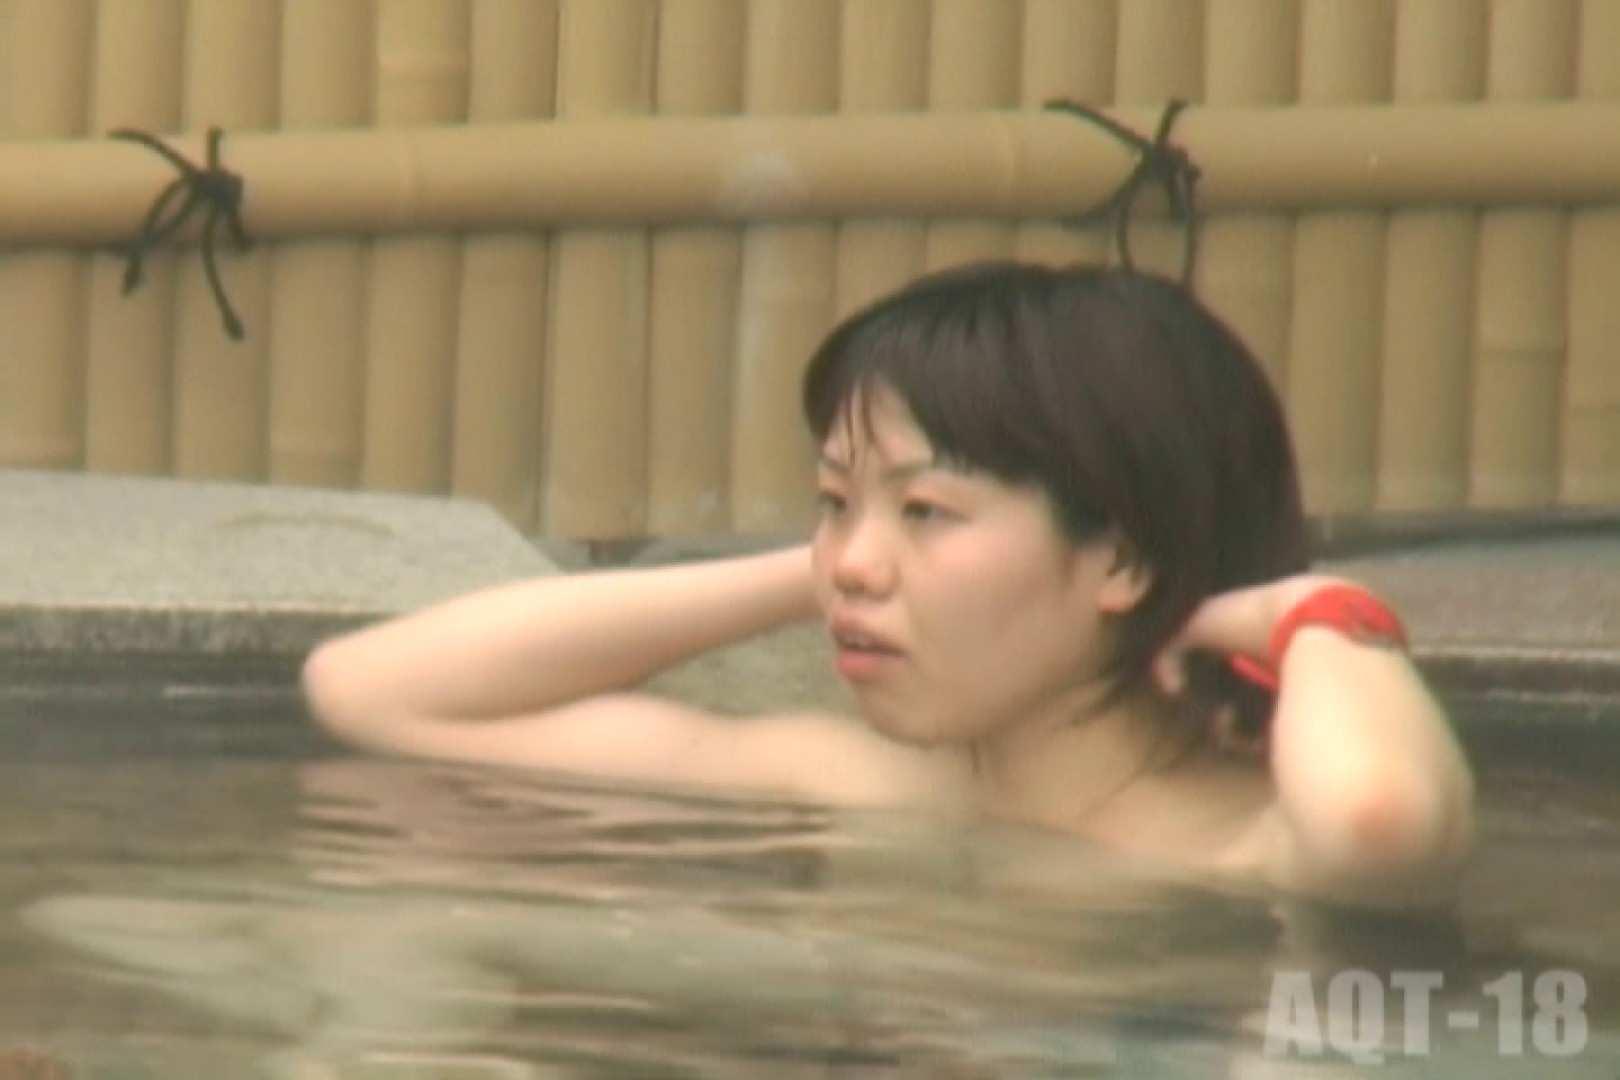 Aquaな露天風呂Vol.861 露天風呂 オメコ無修正動画無料 107連発 53